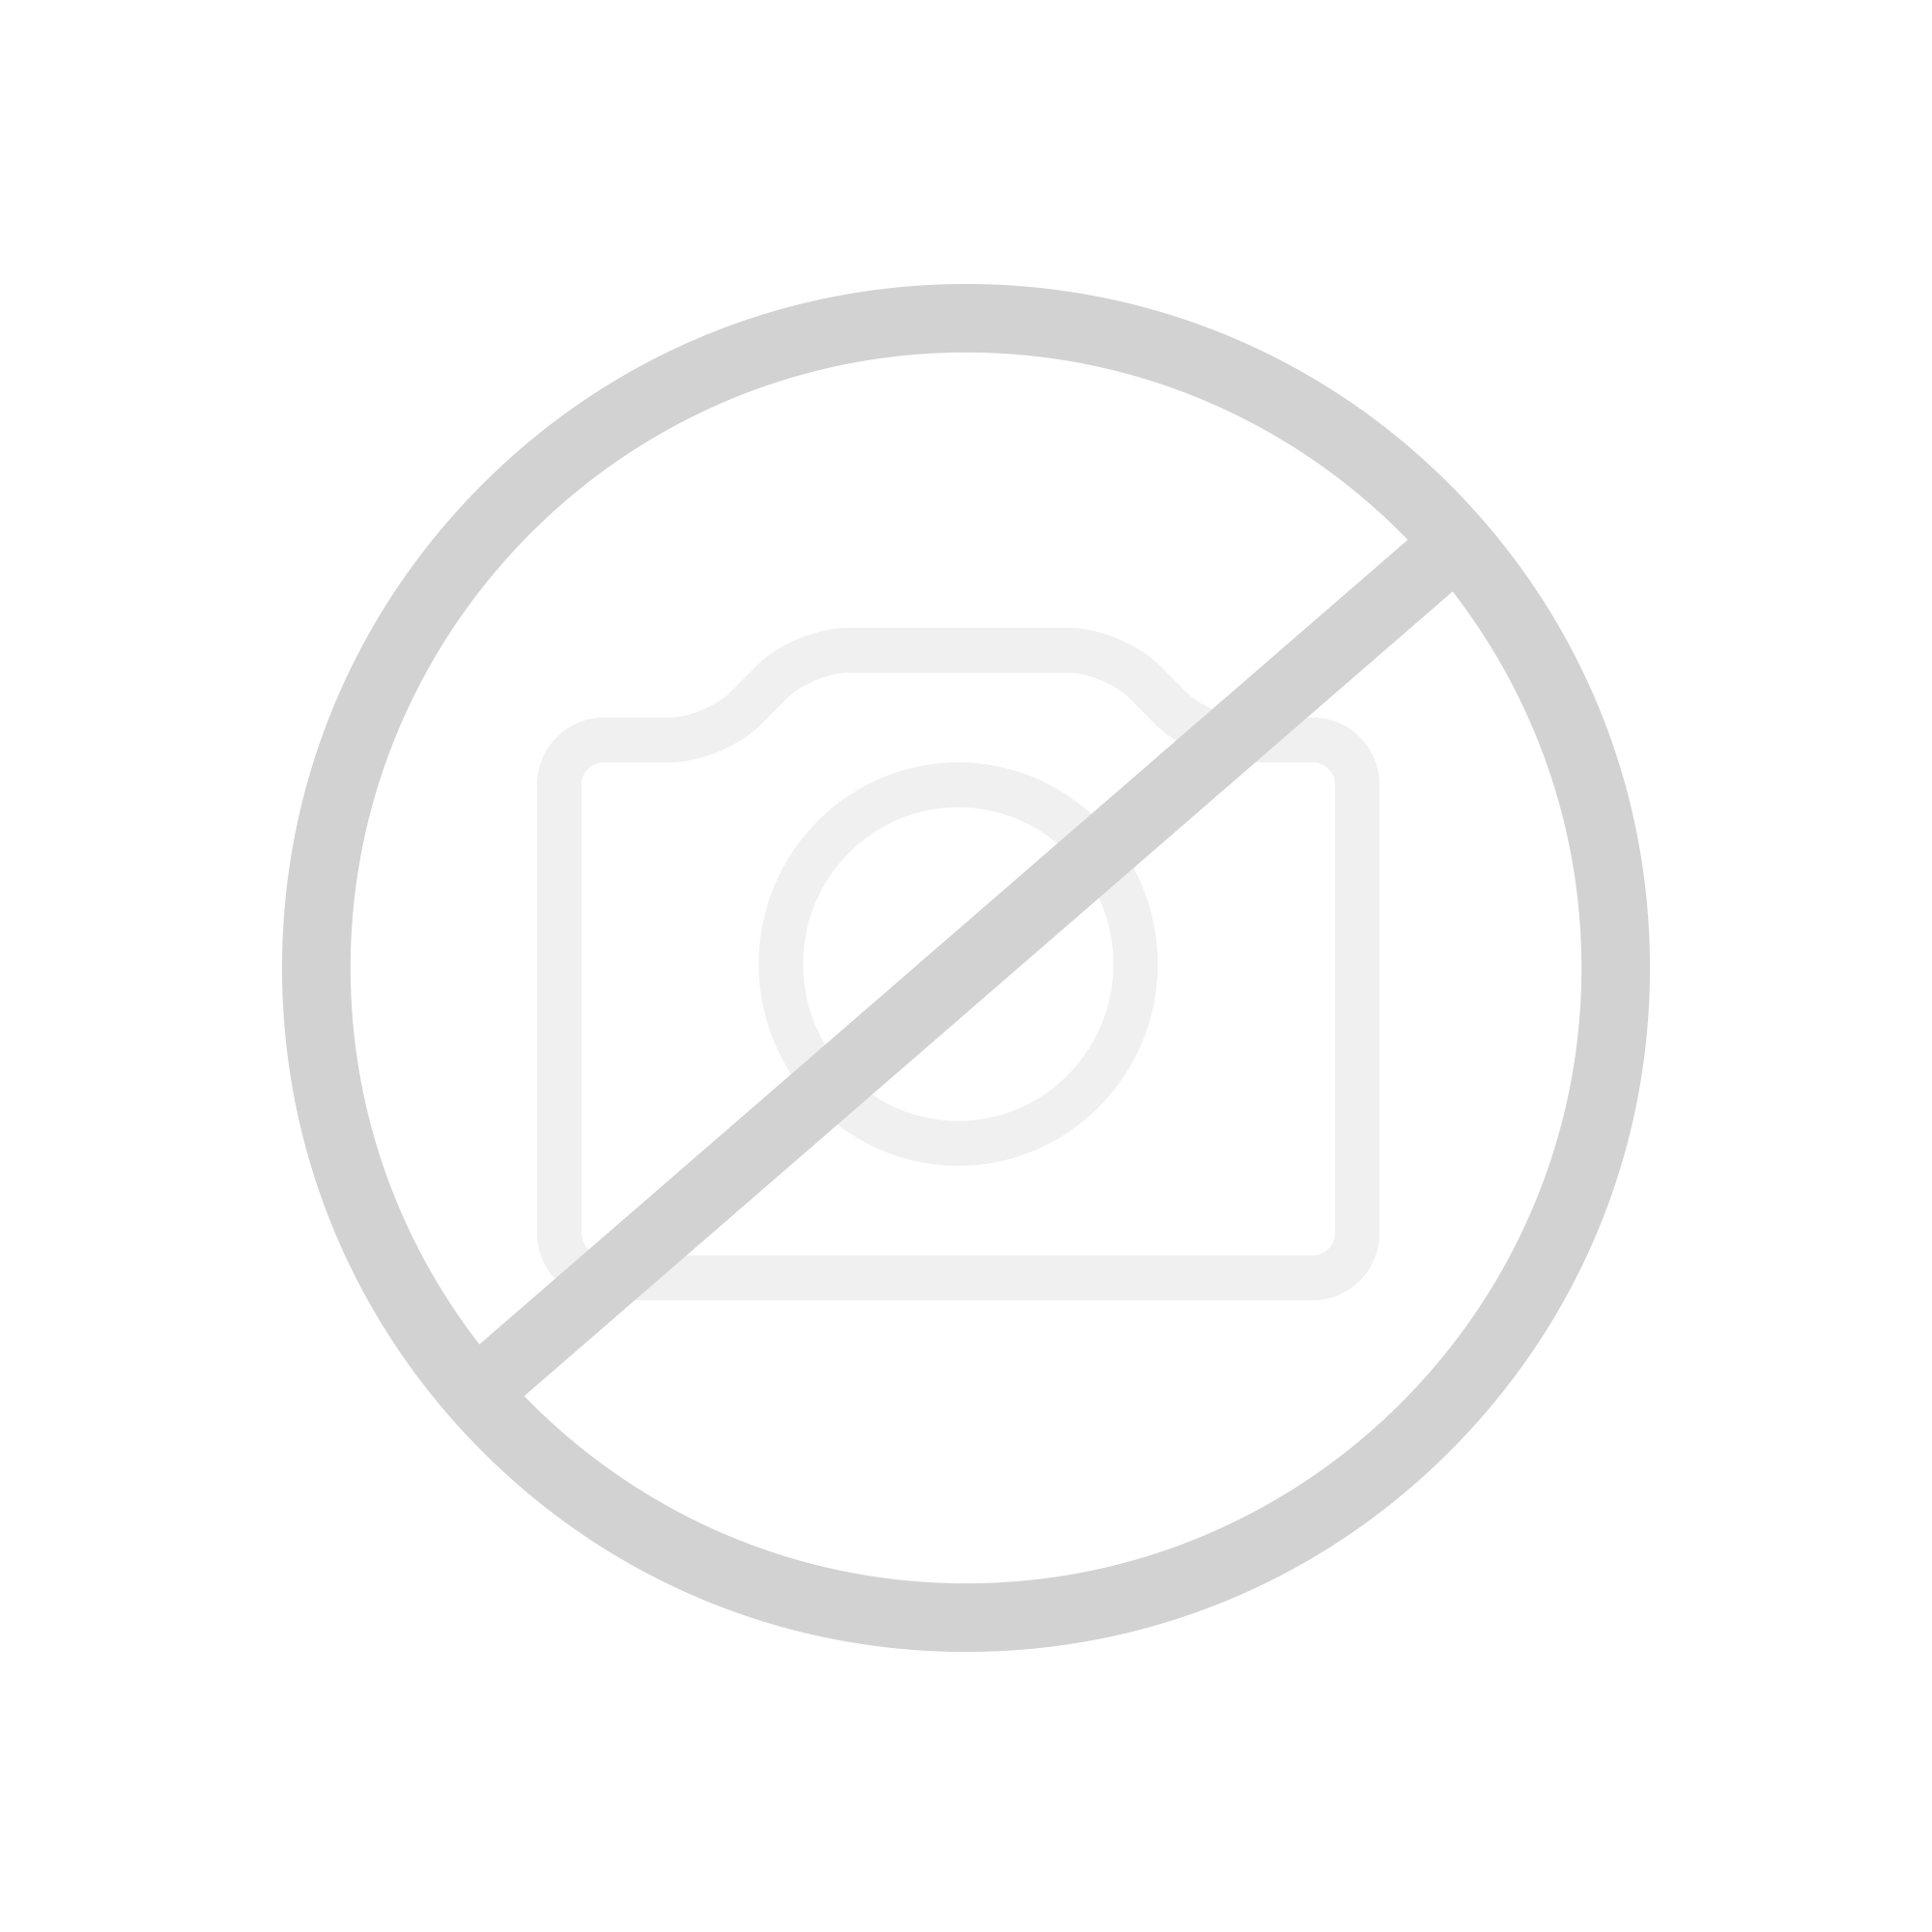 hansgrohe croma select s vario combi set 0 90 m 27014400 reuter onlineshop. Black Bedroom Furniture Sets. Home Design Ideas